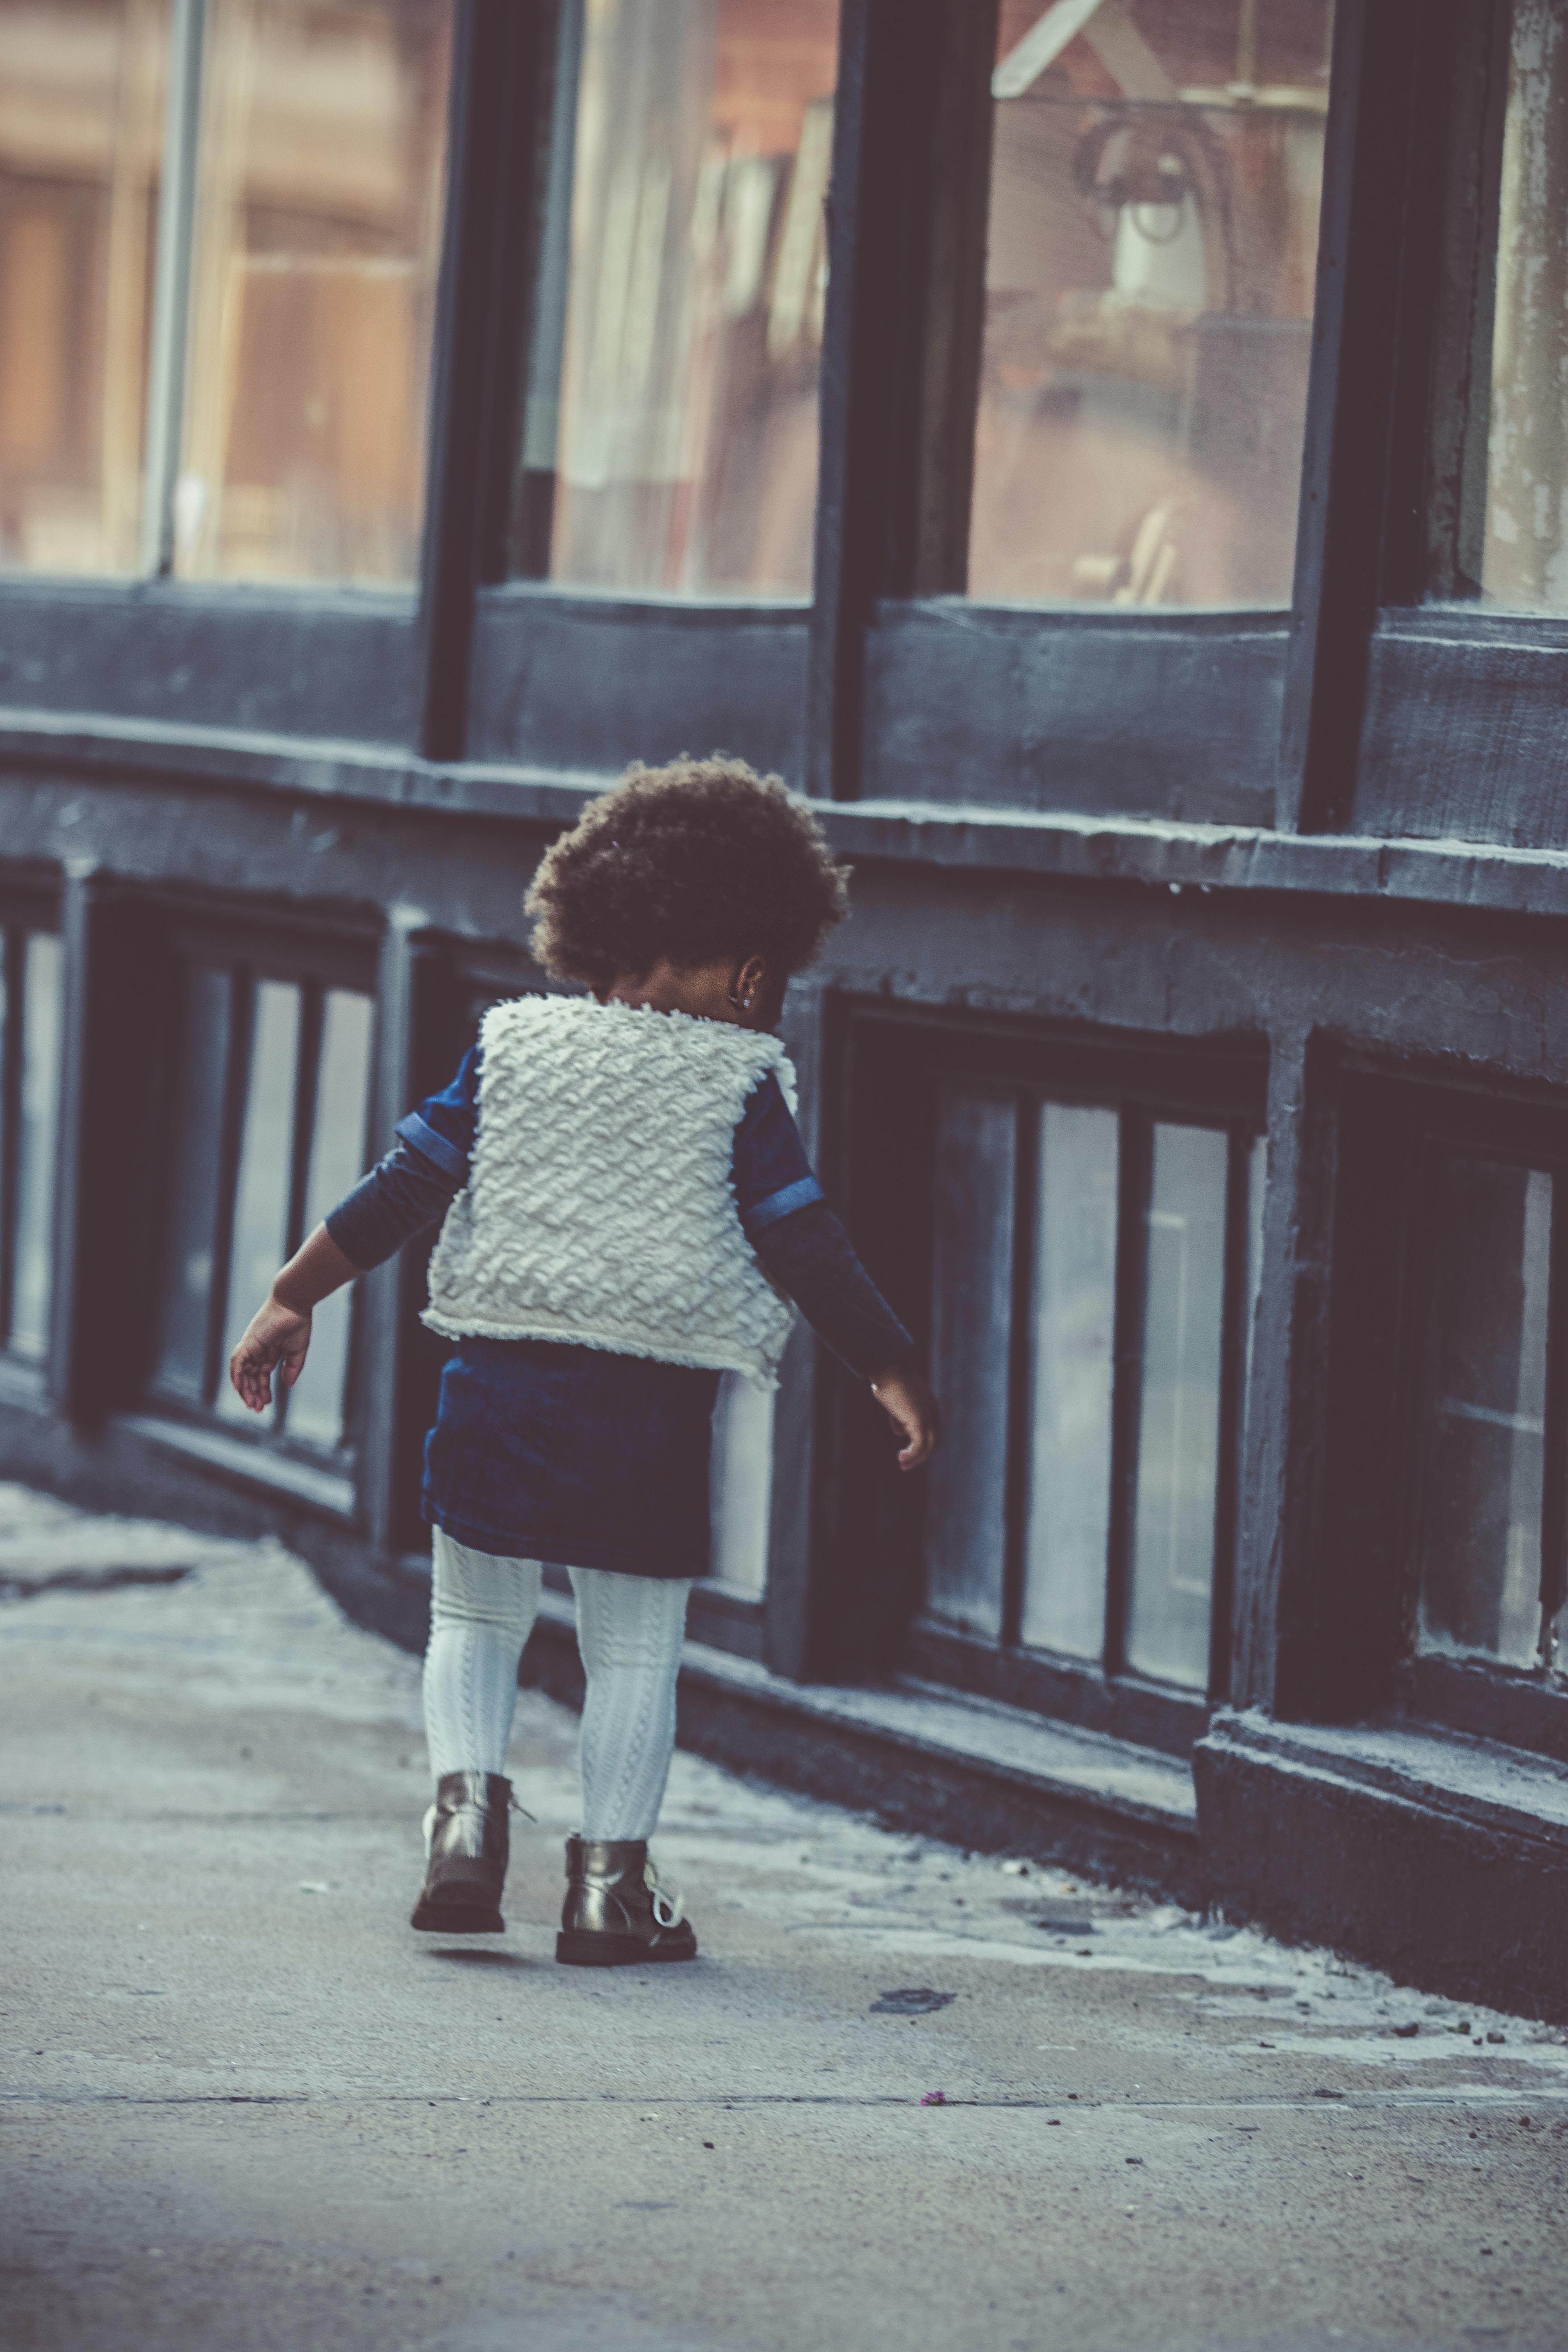 A kid walking down the street.